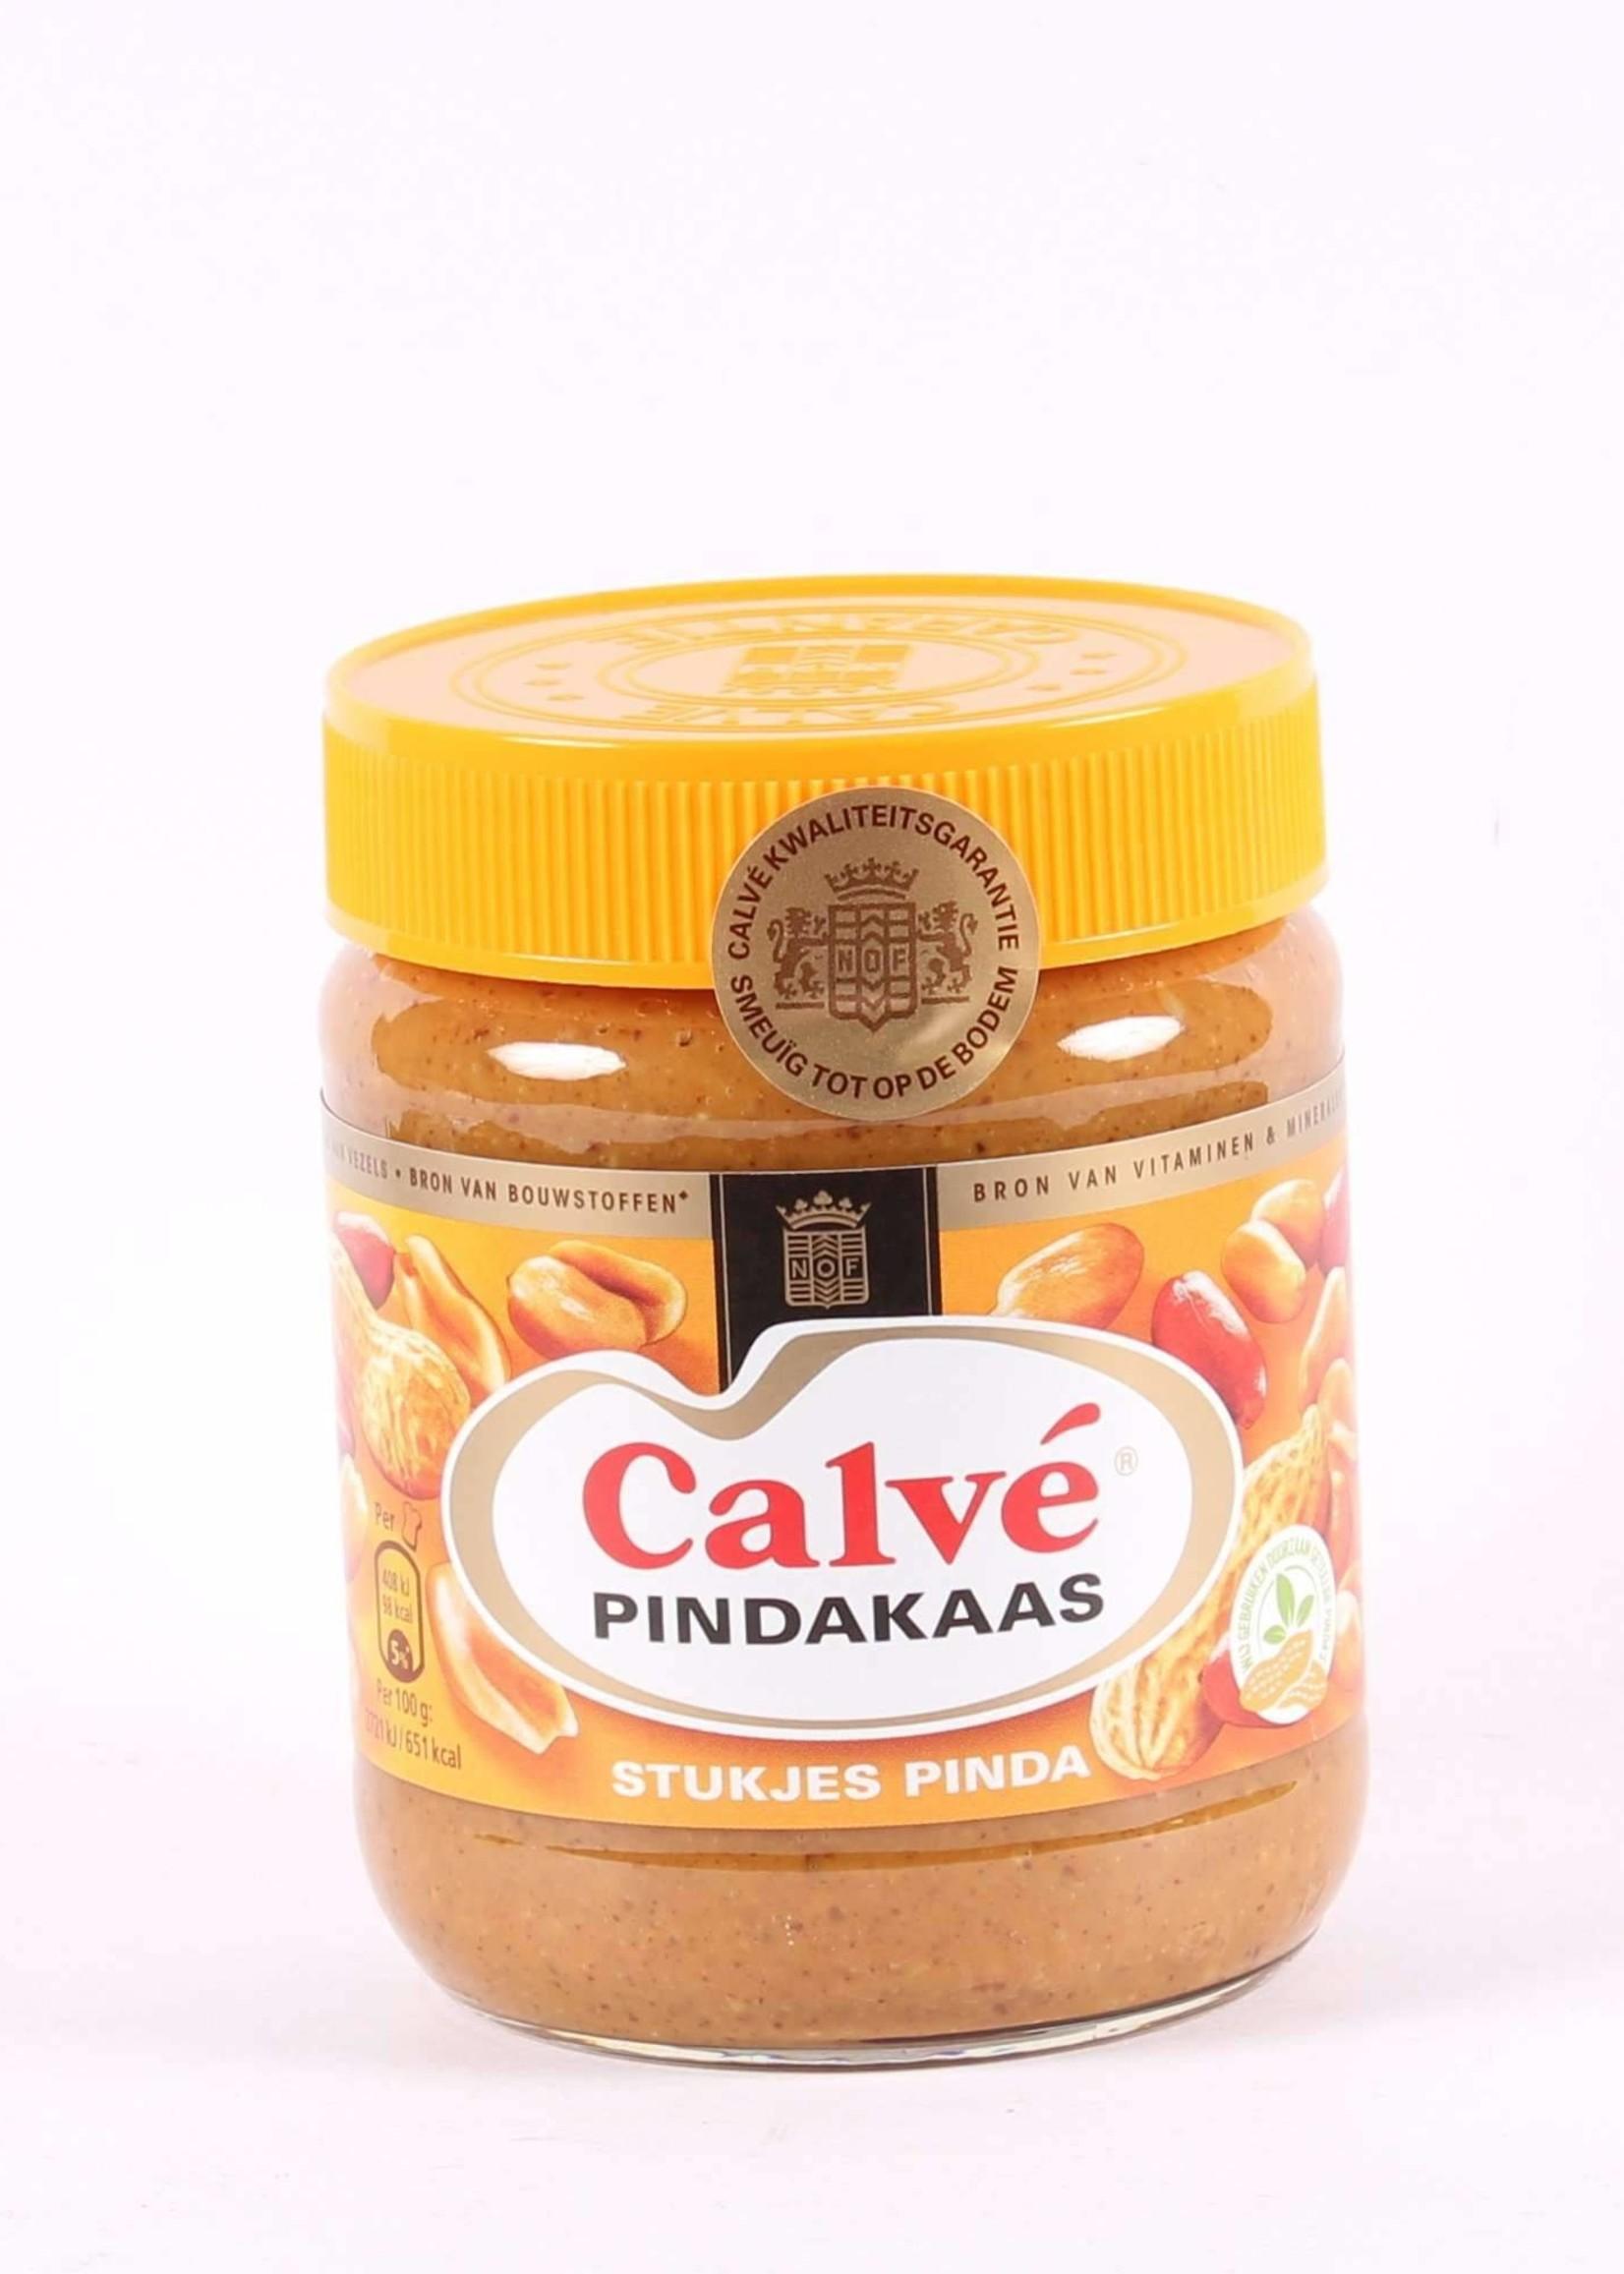 Calvé Pindakaas met stukjes Pinda, Hollandse Pindakaas